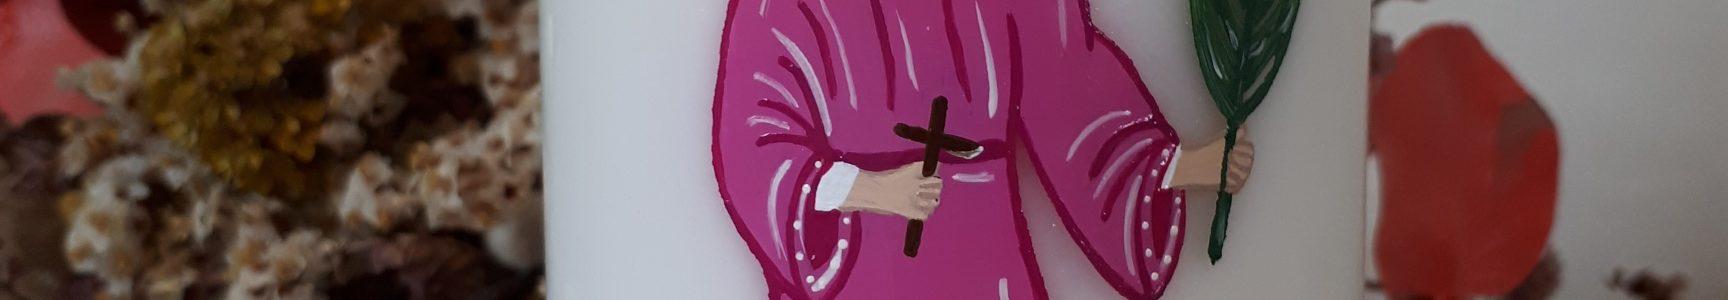 Sainte Victoire (de plein pied)